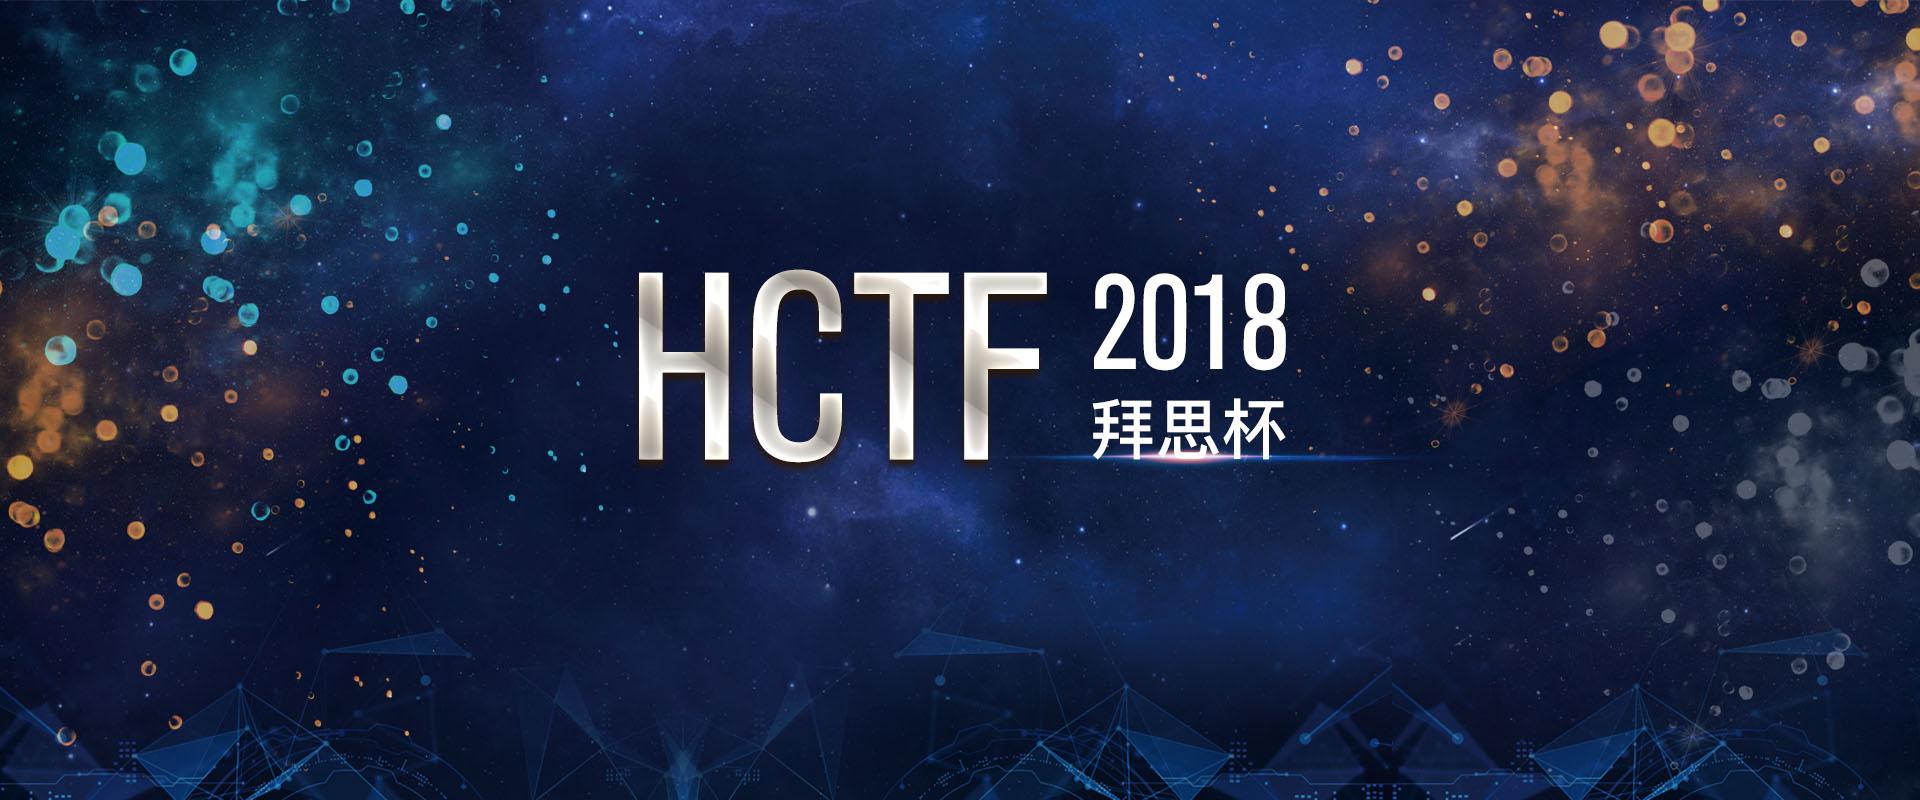 HCTF2018_CNSS_WRITEUP